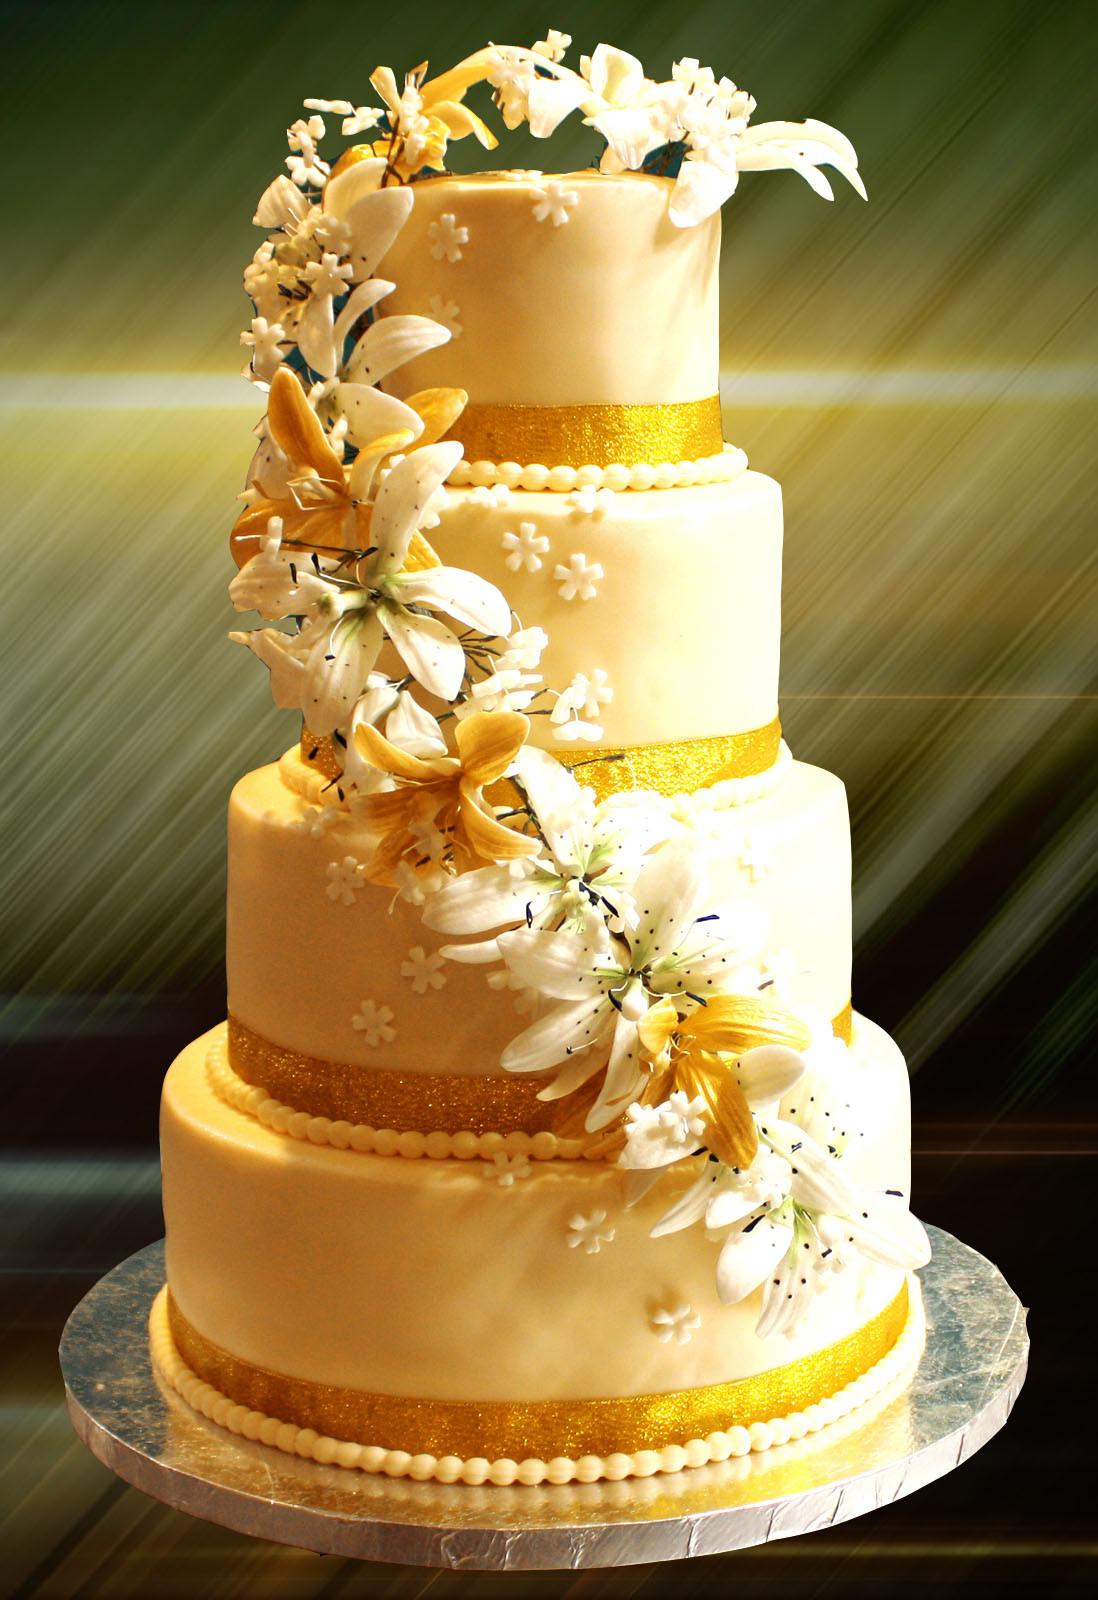 Wedding Birthday Cake  wedding cake in Dubai